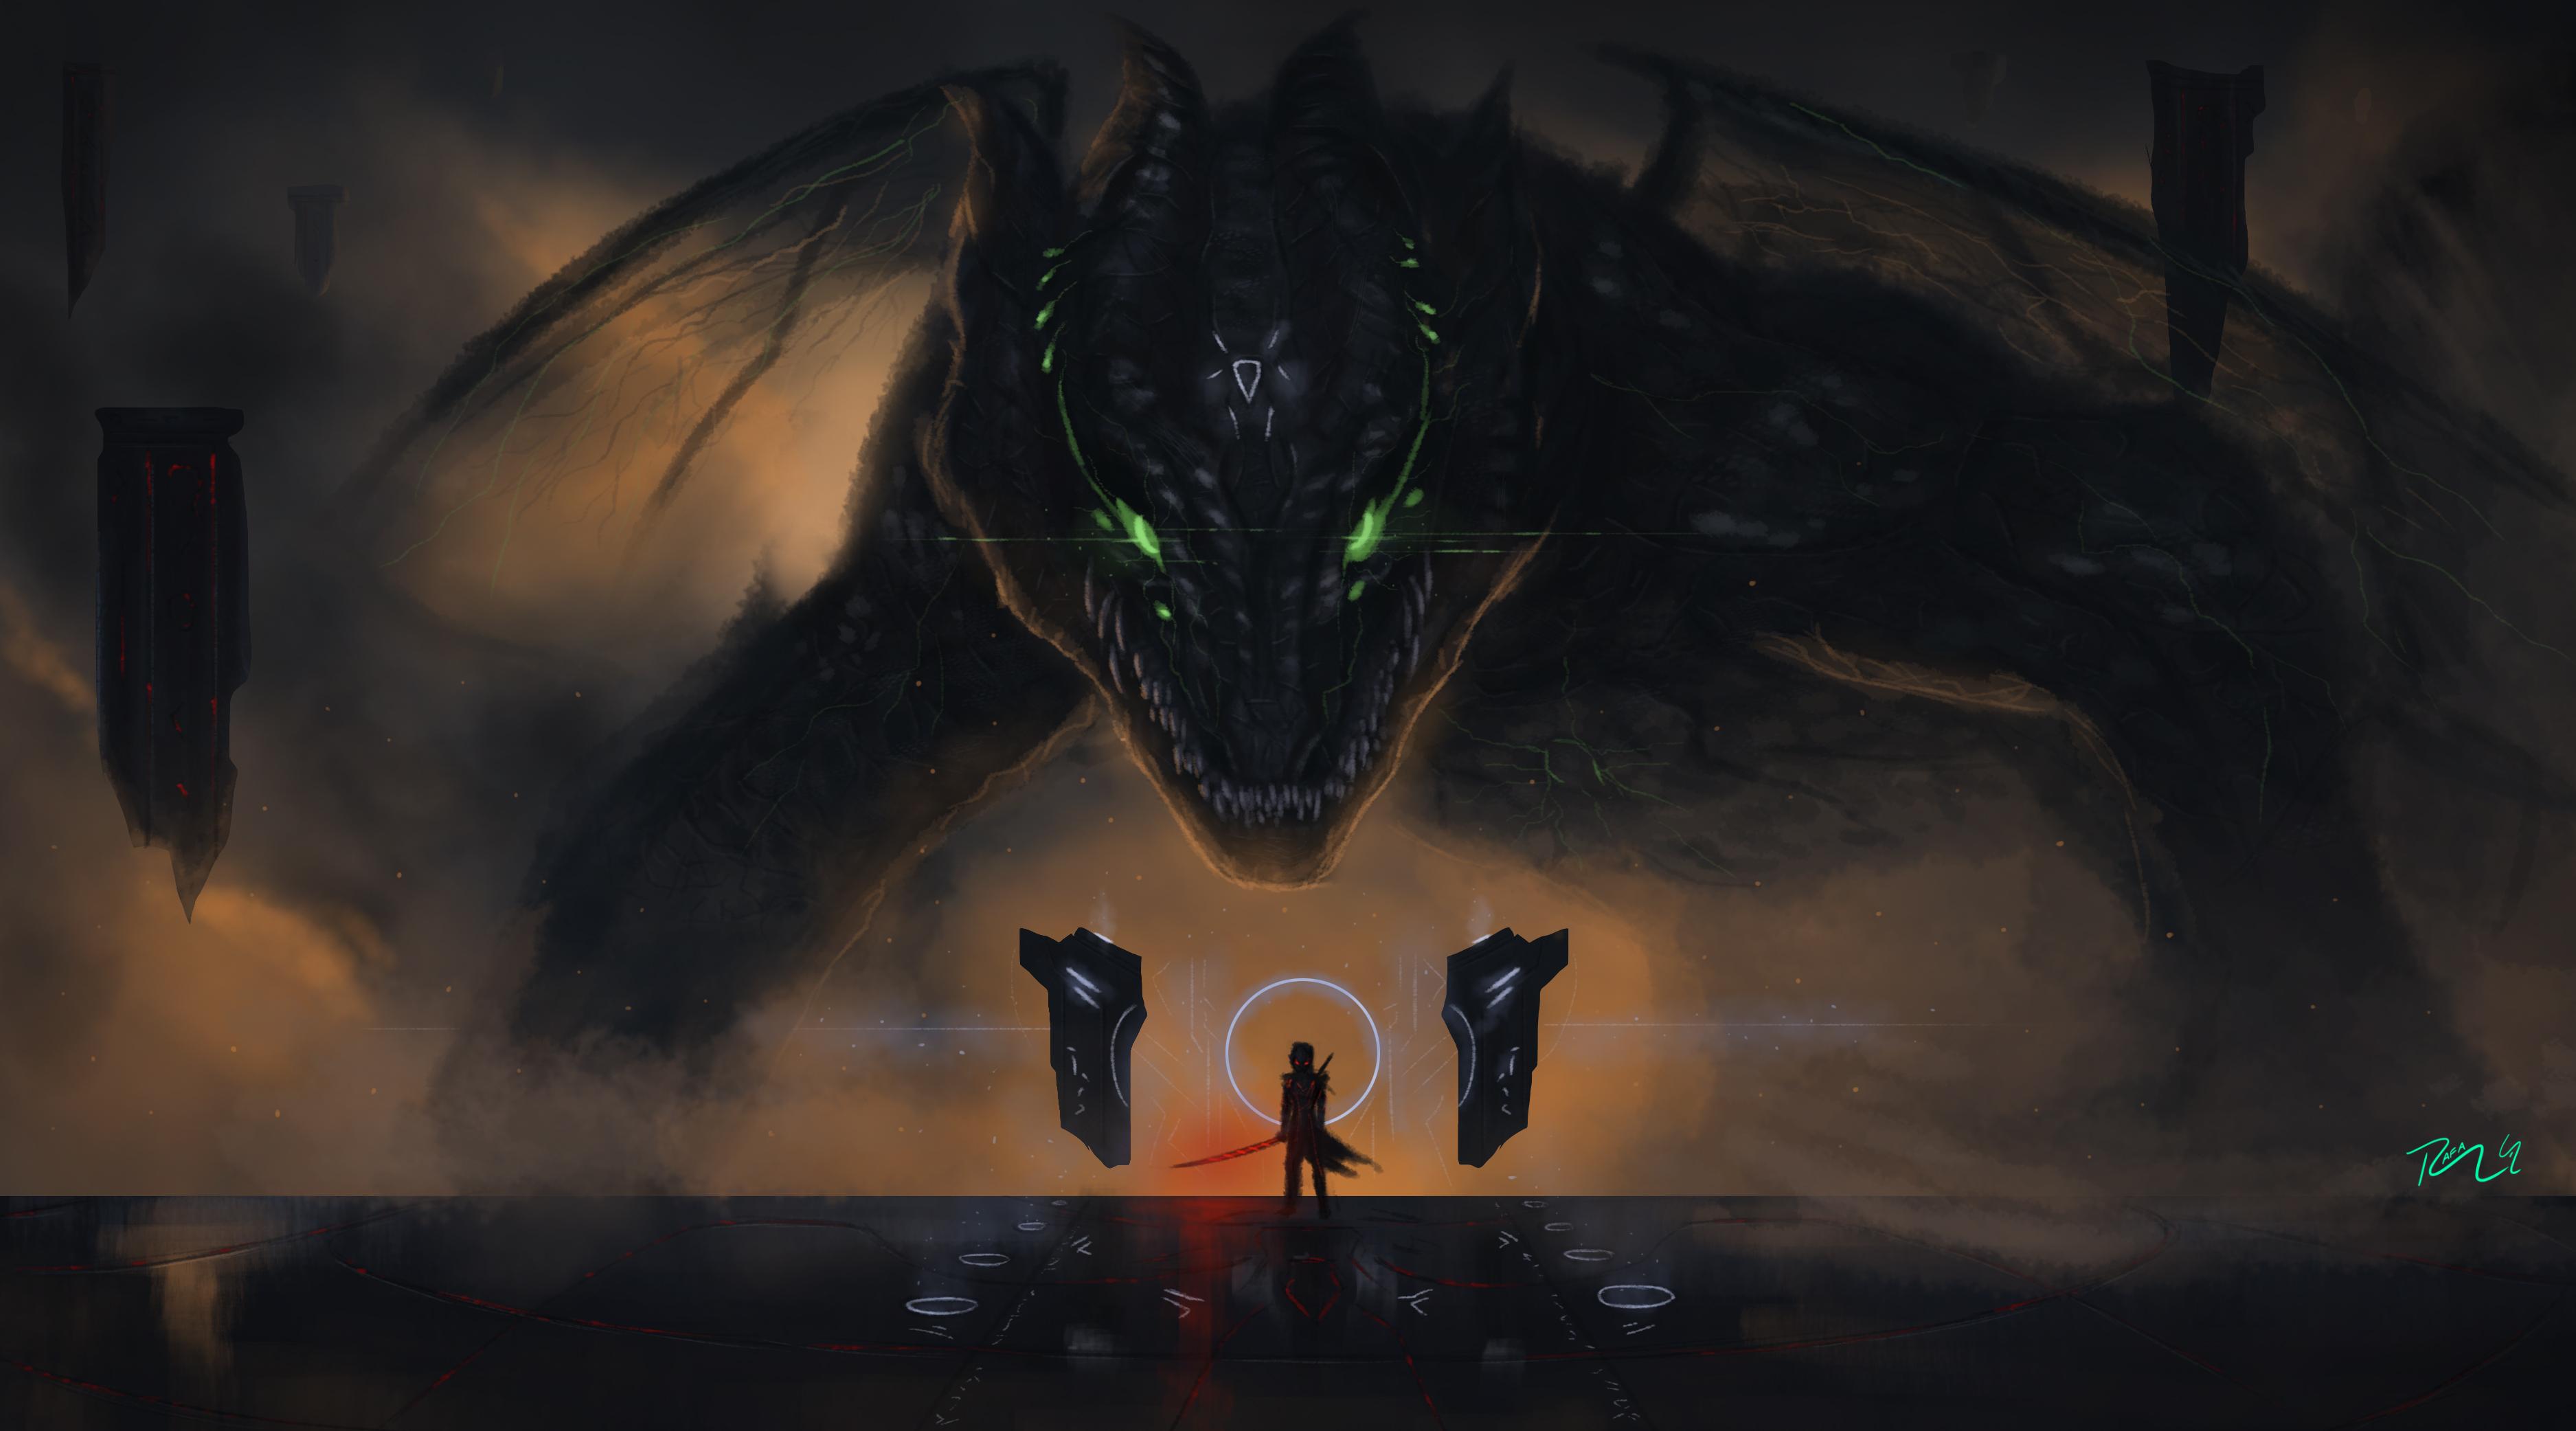 aeon awakening dragon evil fear fury million oblivion 4k hd artist